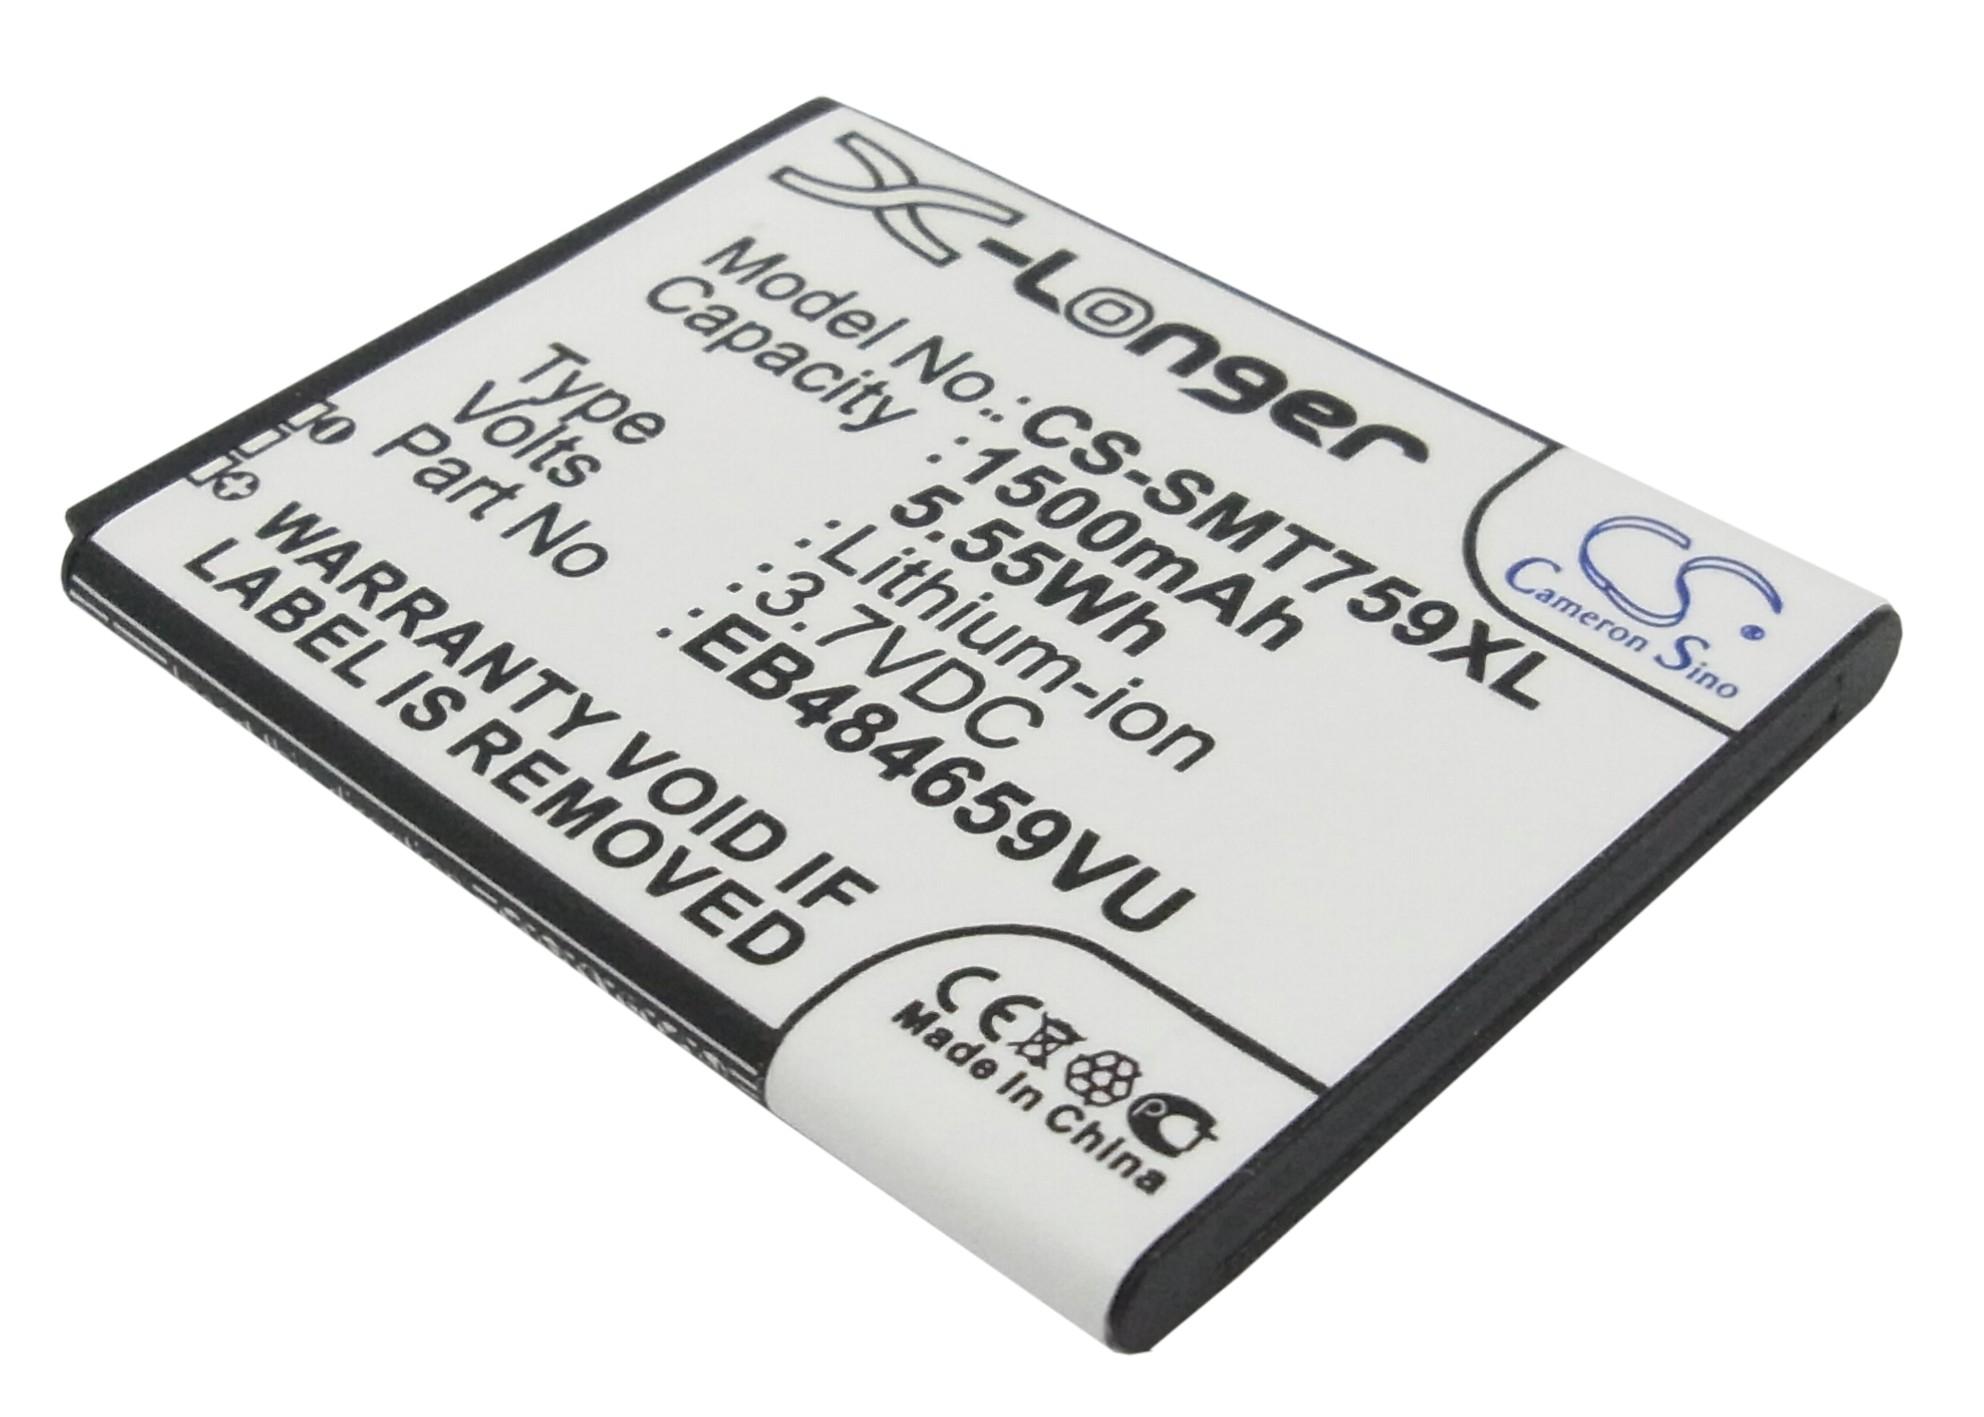 Cameron Sino baterie do mobilů pro SAMSUNG GT-S8600 3.7V Li-ion 1500mAh černá - neoriginální